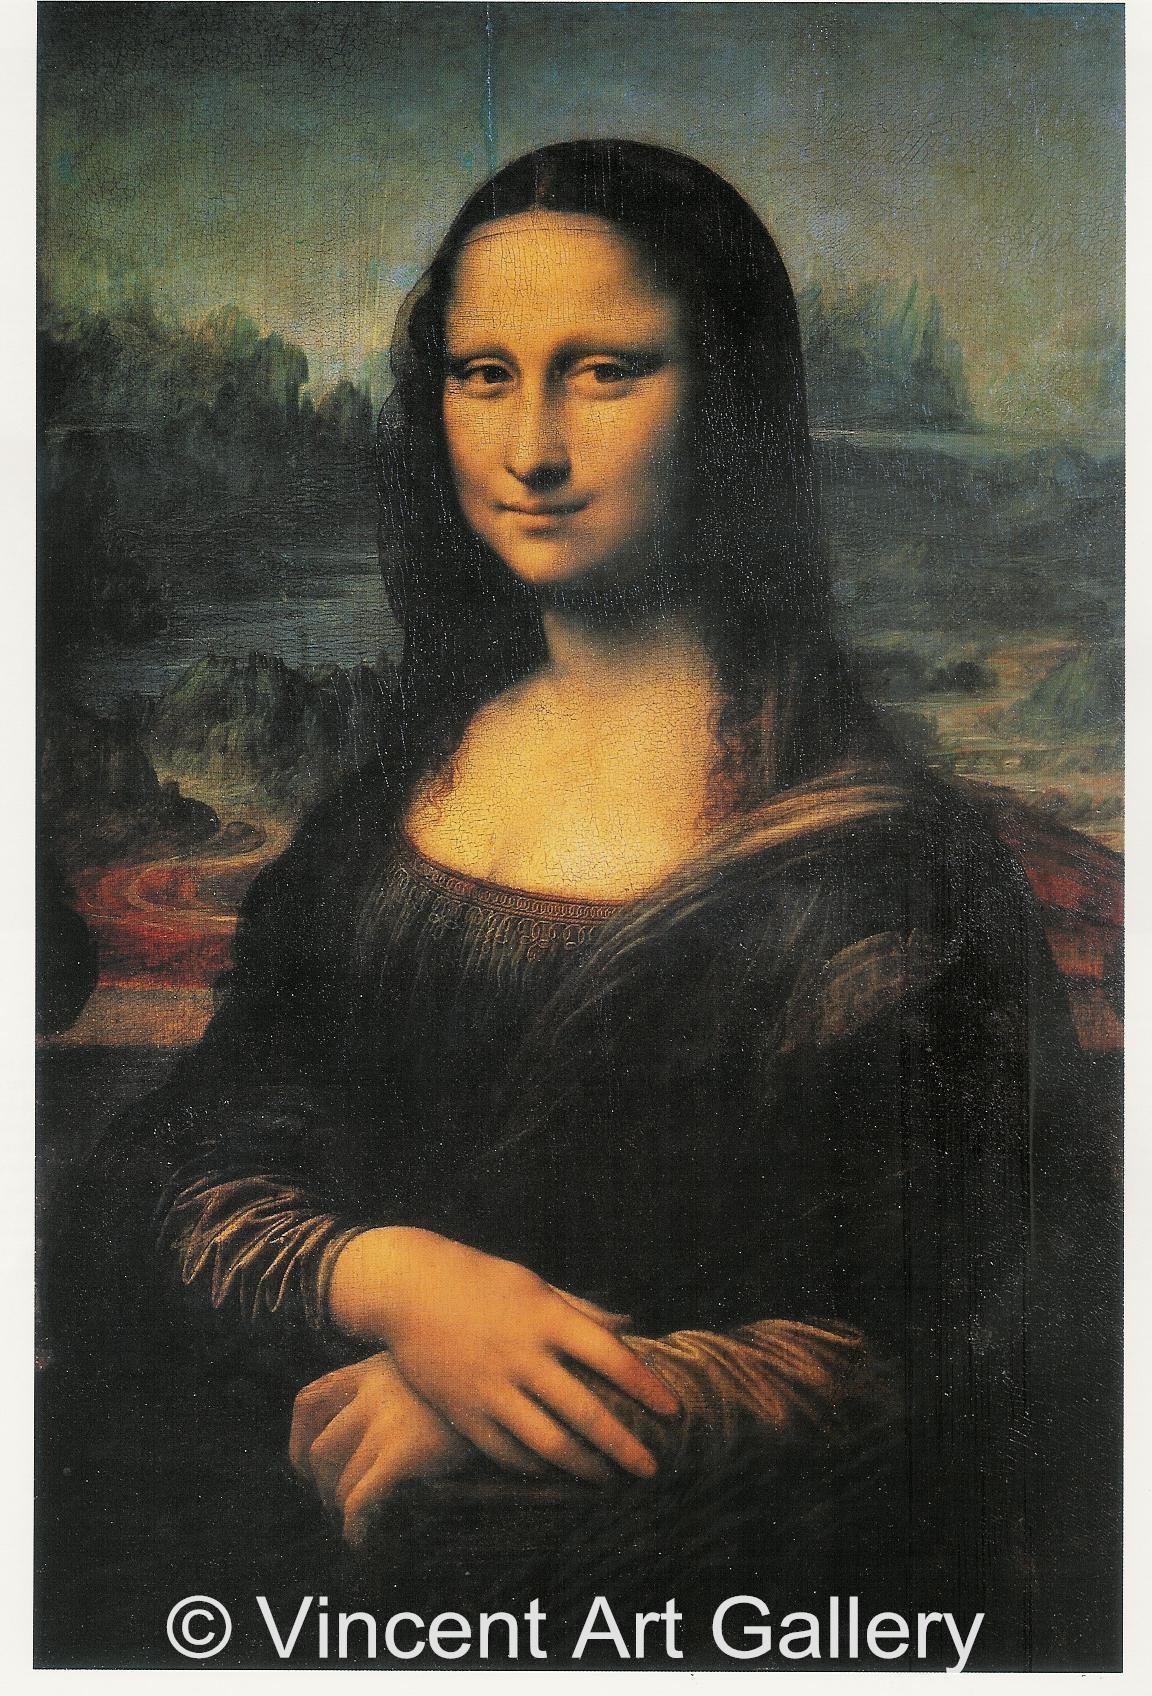 image Mona da vinci from germany